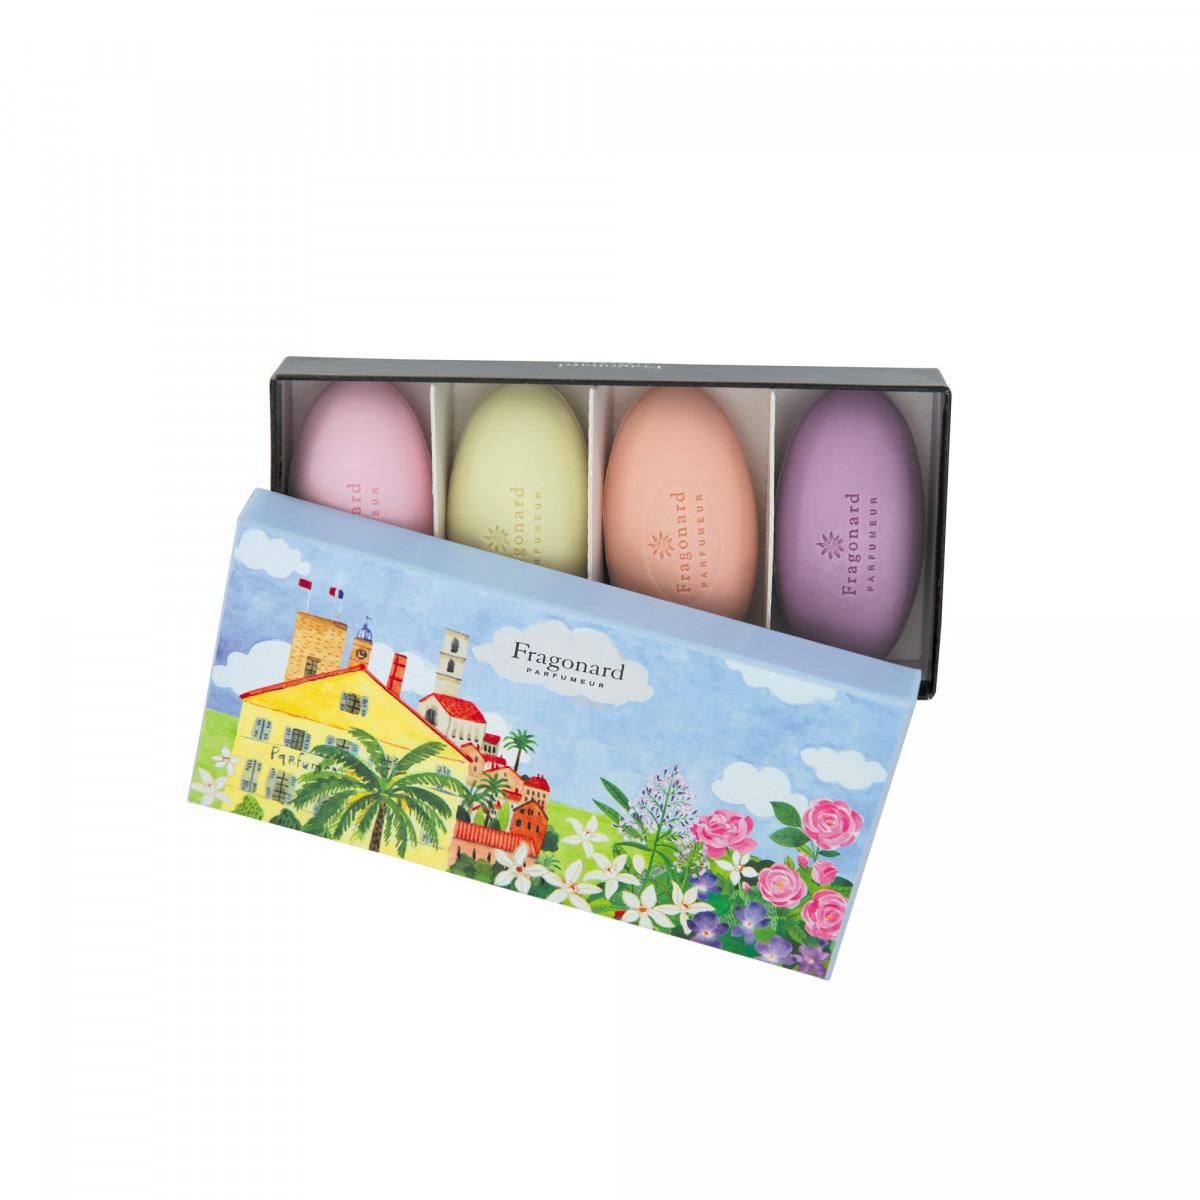 Fragonard guest soap box Riviera